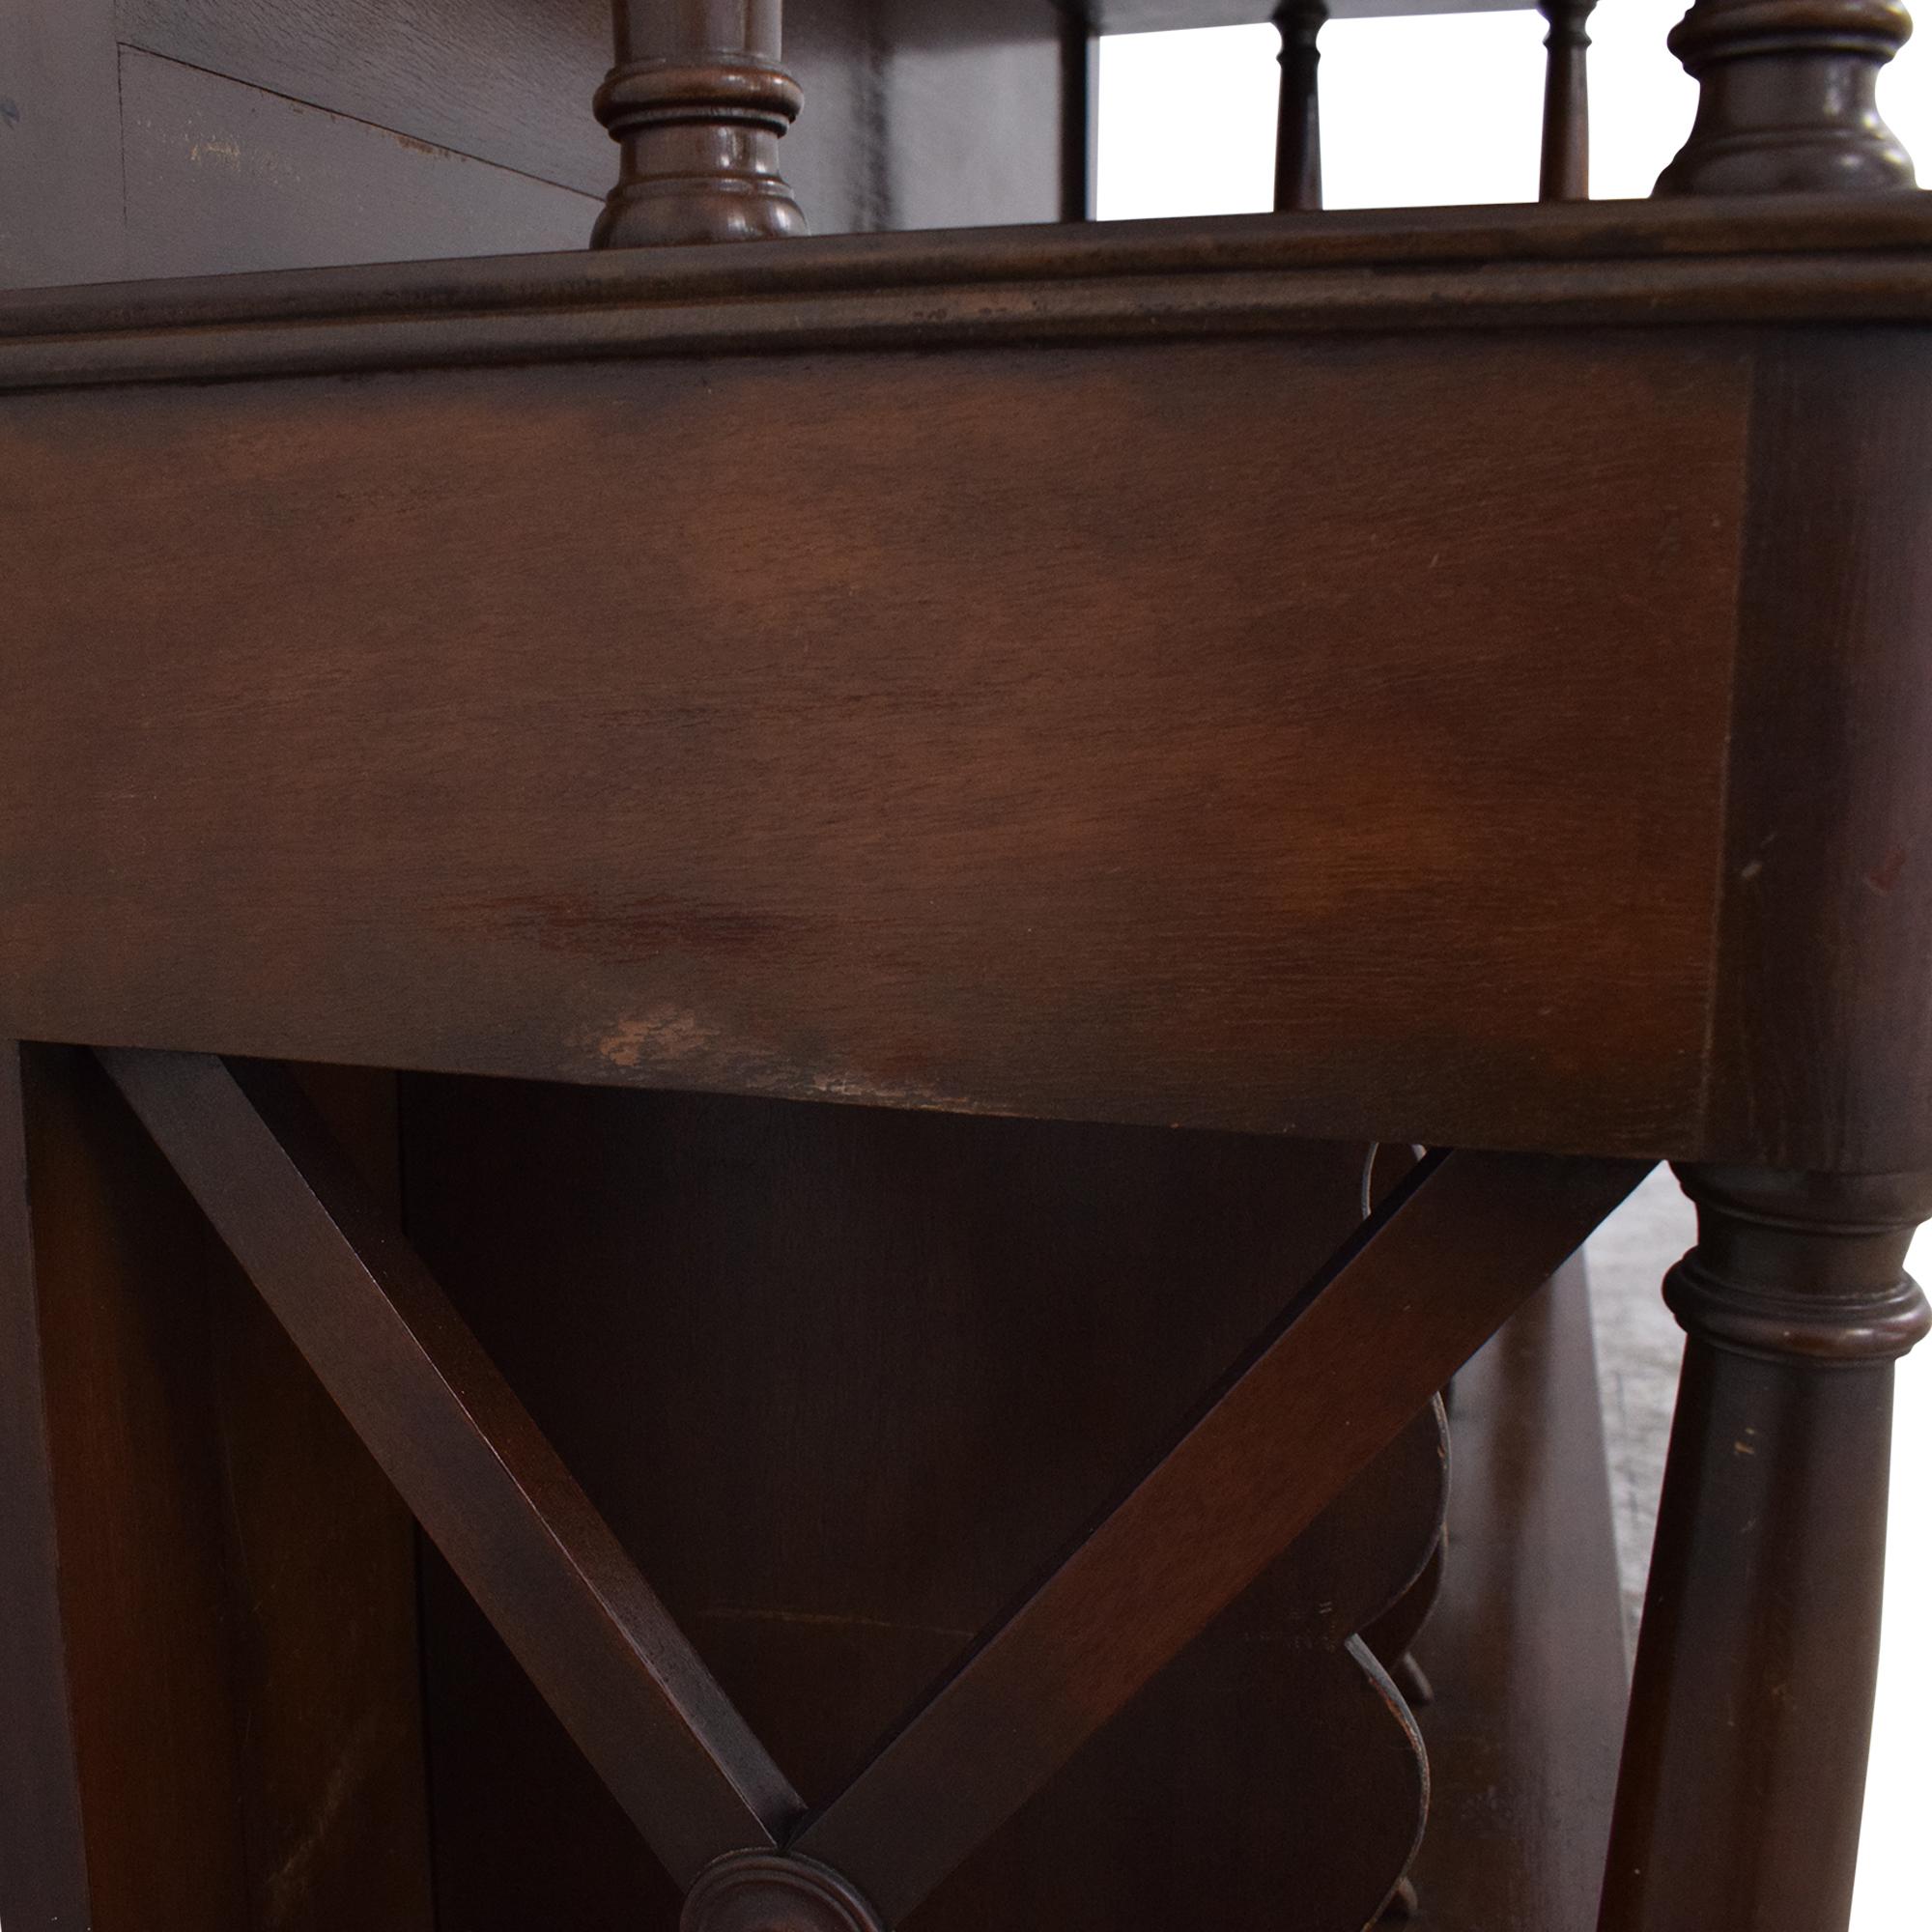 Vintage Four Drawer Sideboard dimensions